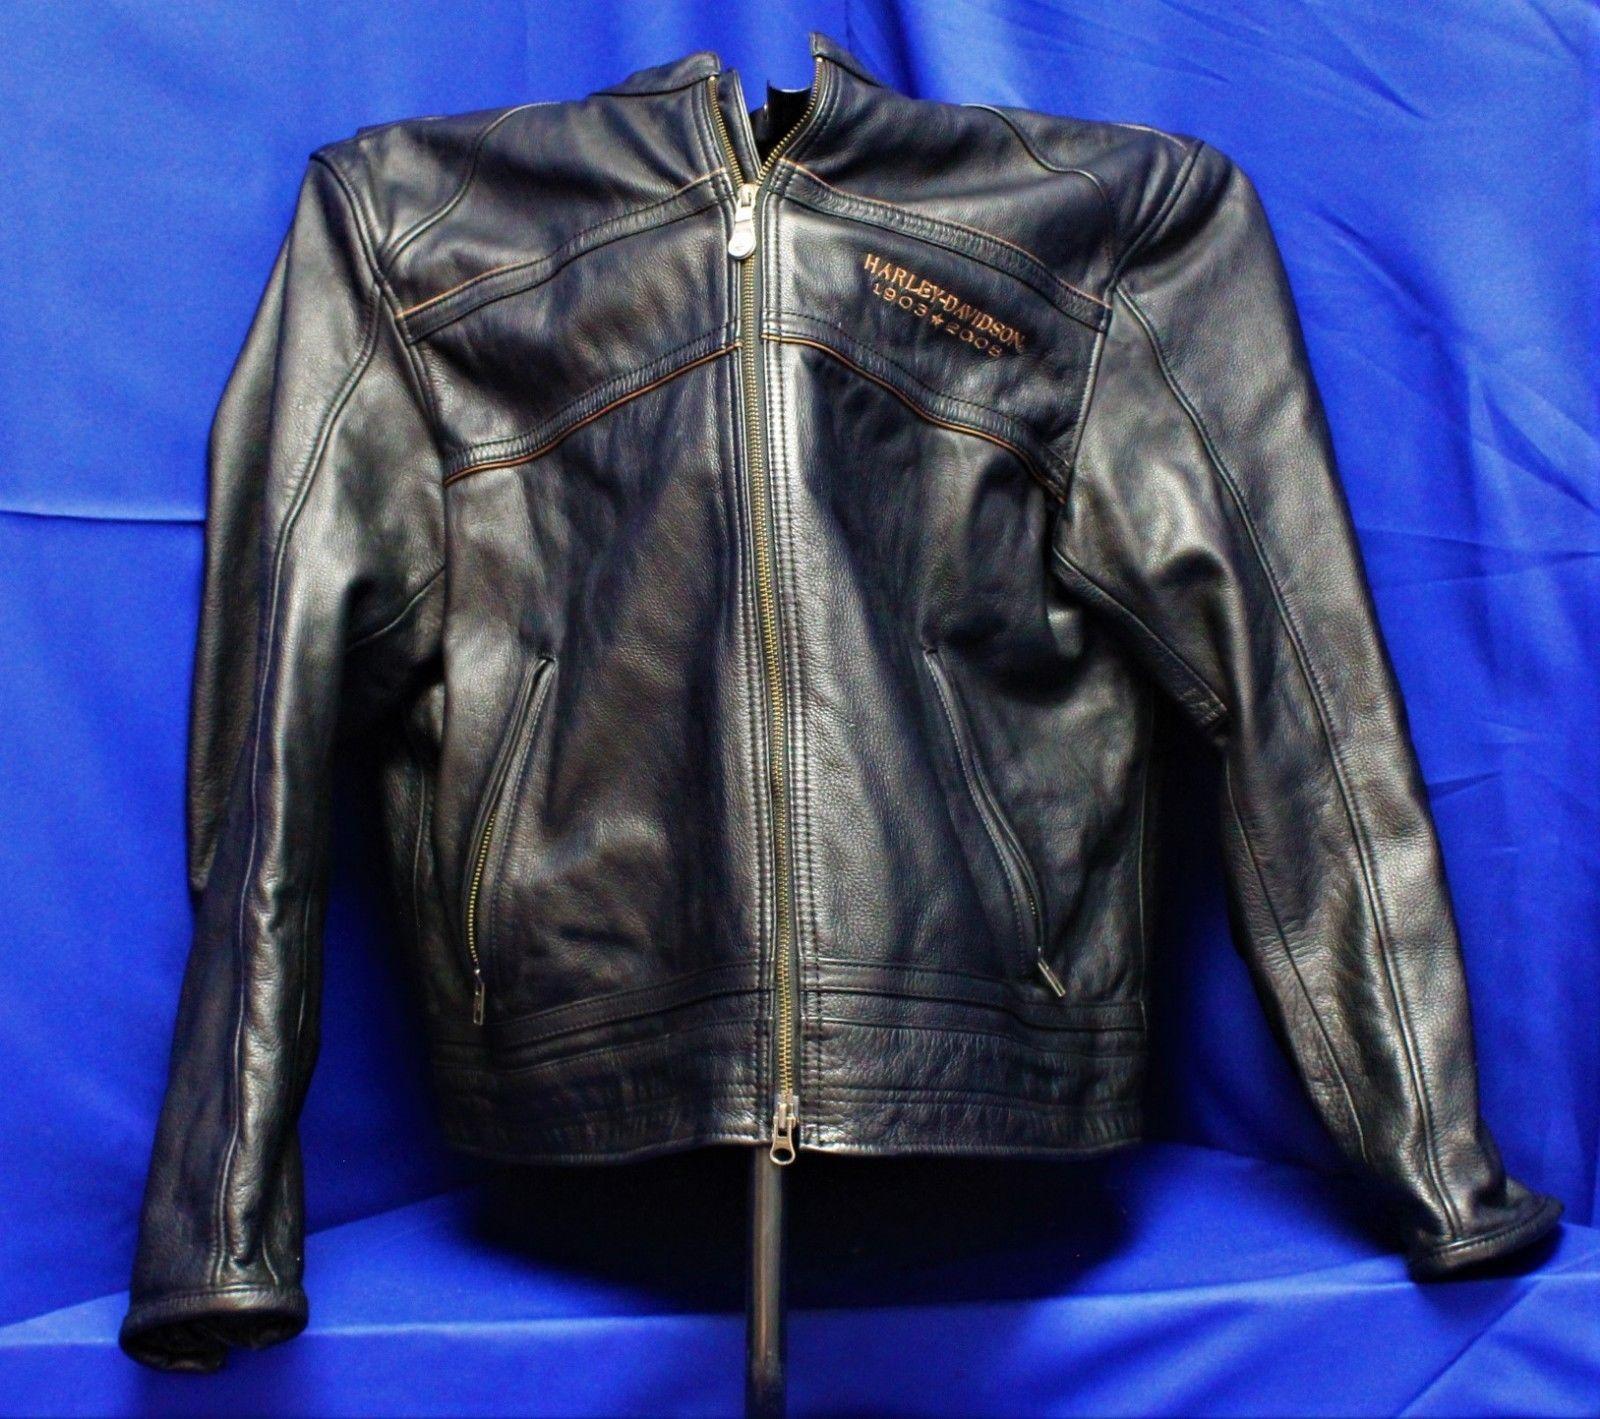 Harley Davidson 105th Anniversary Leather Jacket Men S Xxl Ebay Link Leather Jacket Men Leather Jacket Mens Jackets [ 1419 x 1600 Pixel ]